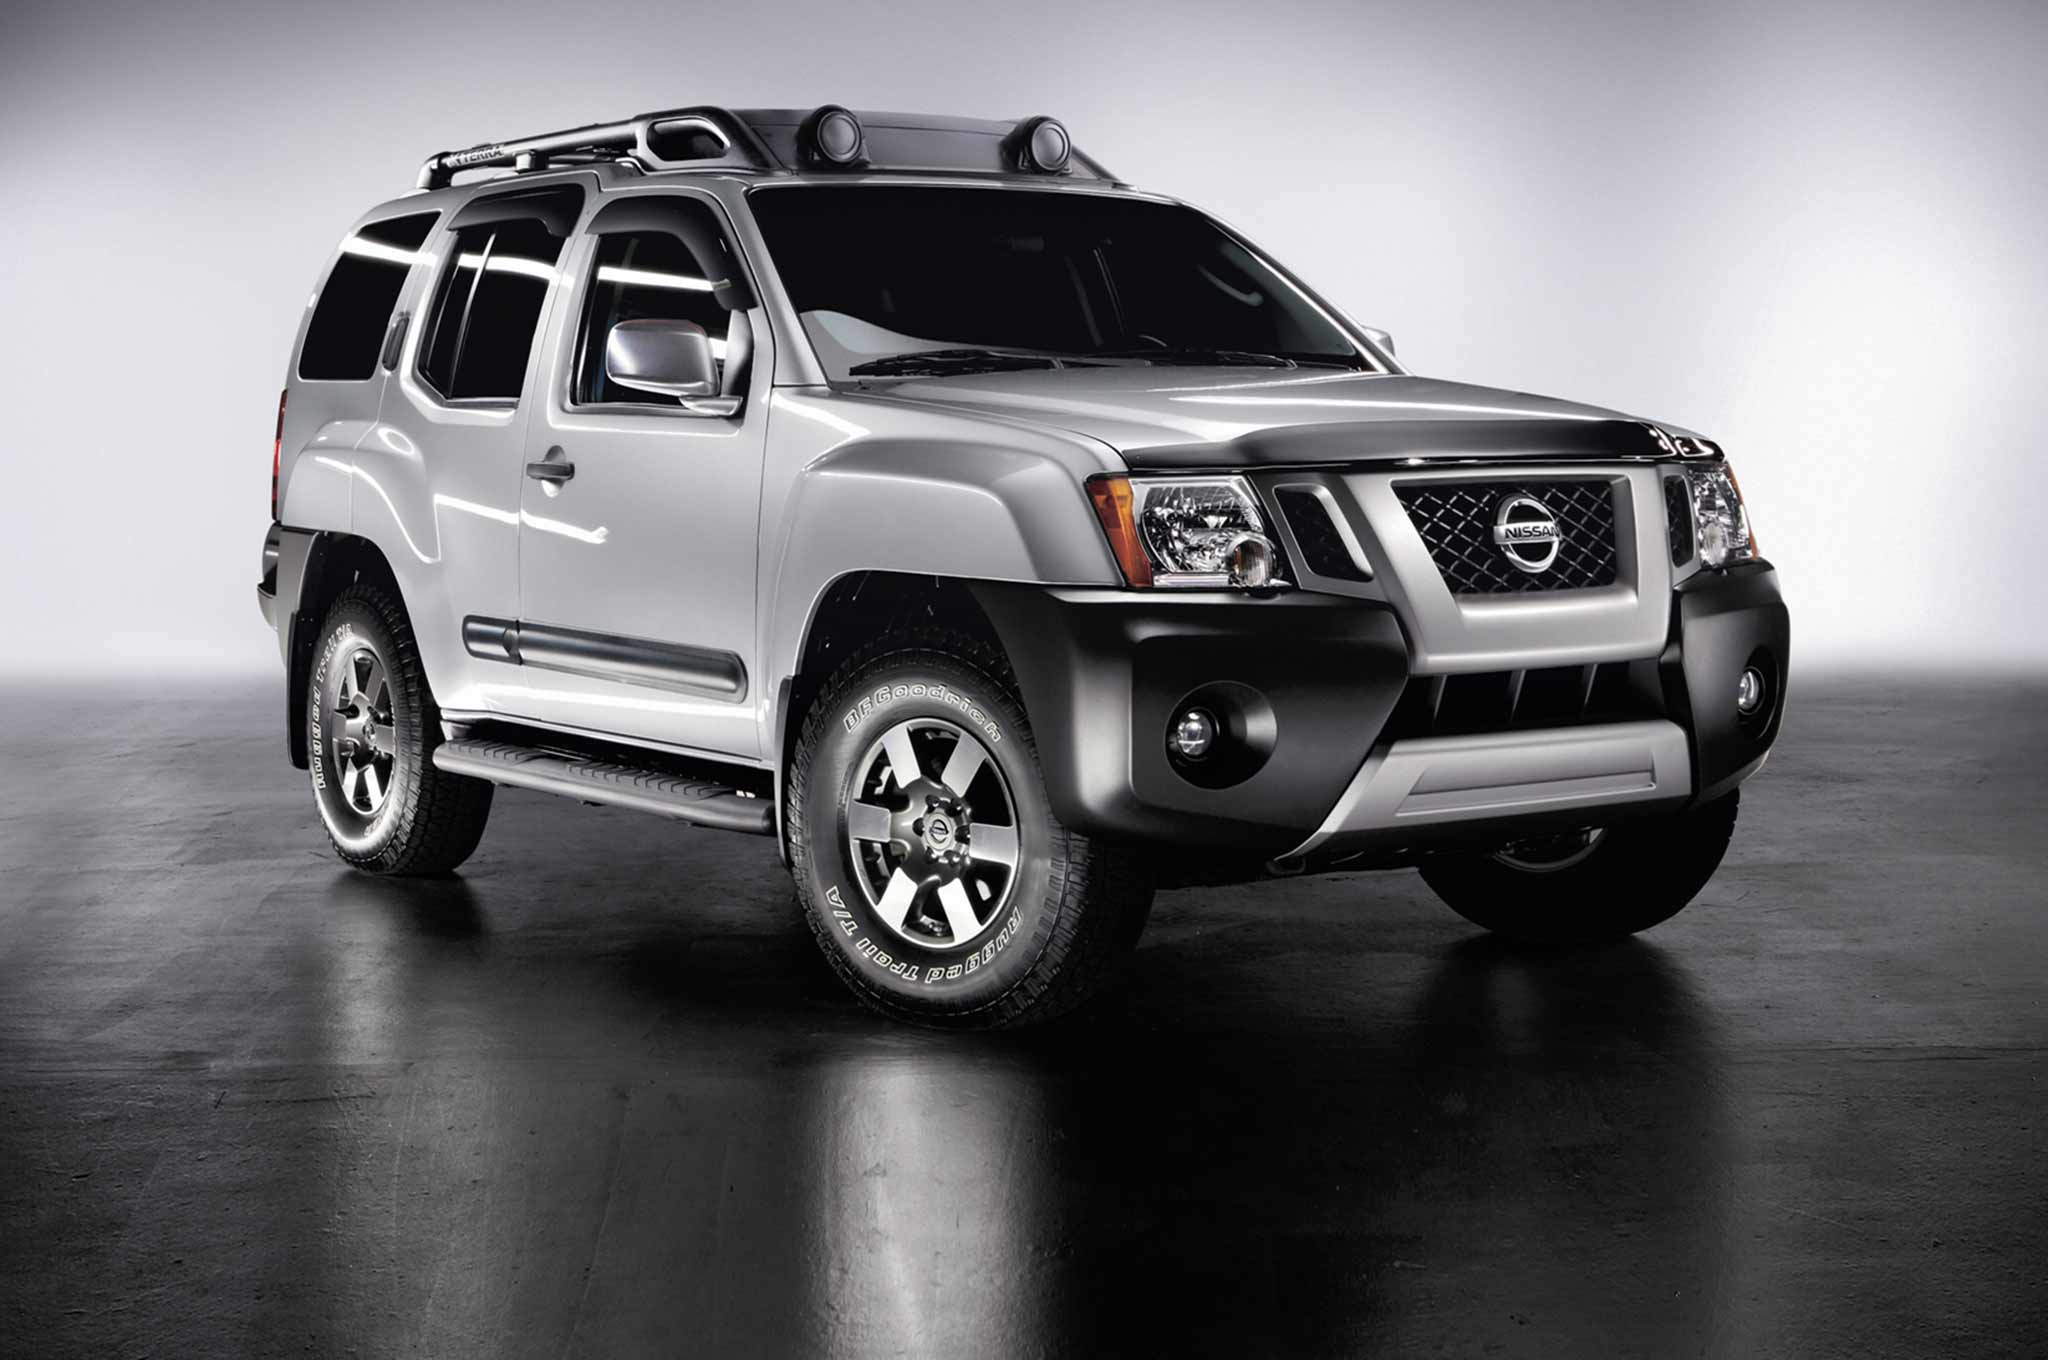 2013 Nissan Xterra Front Three Quarter